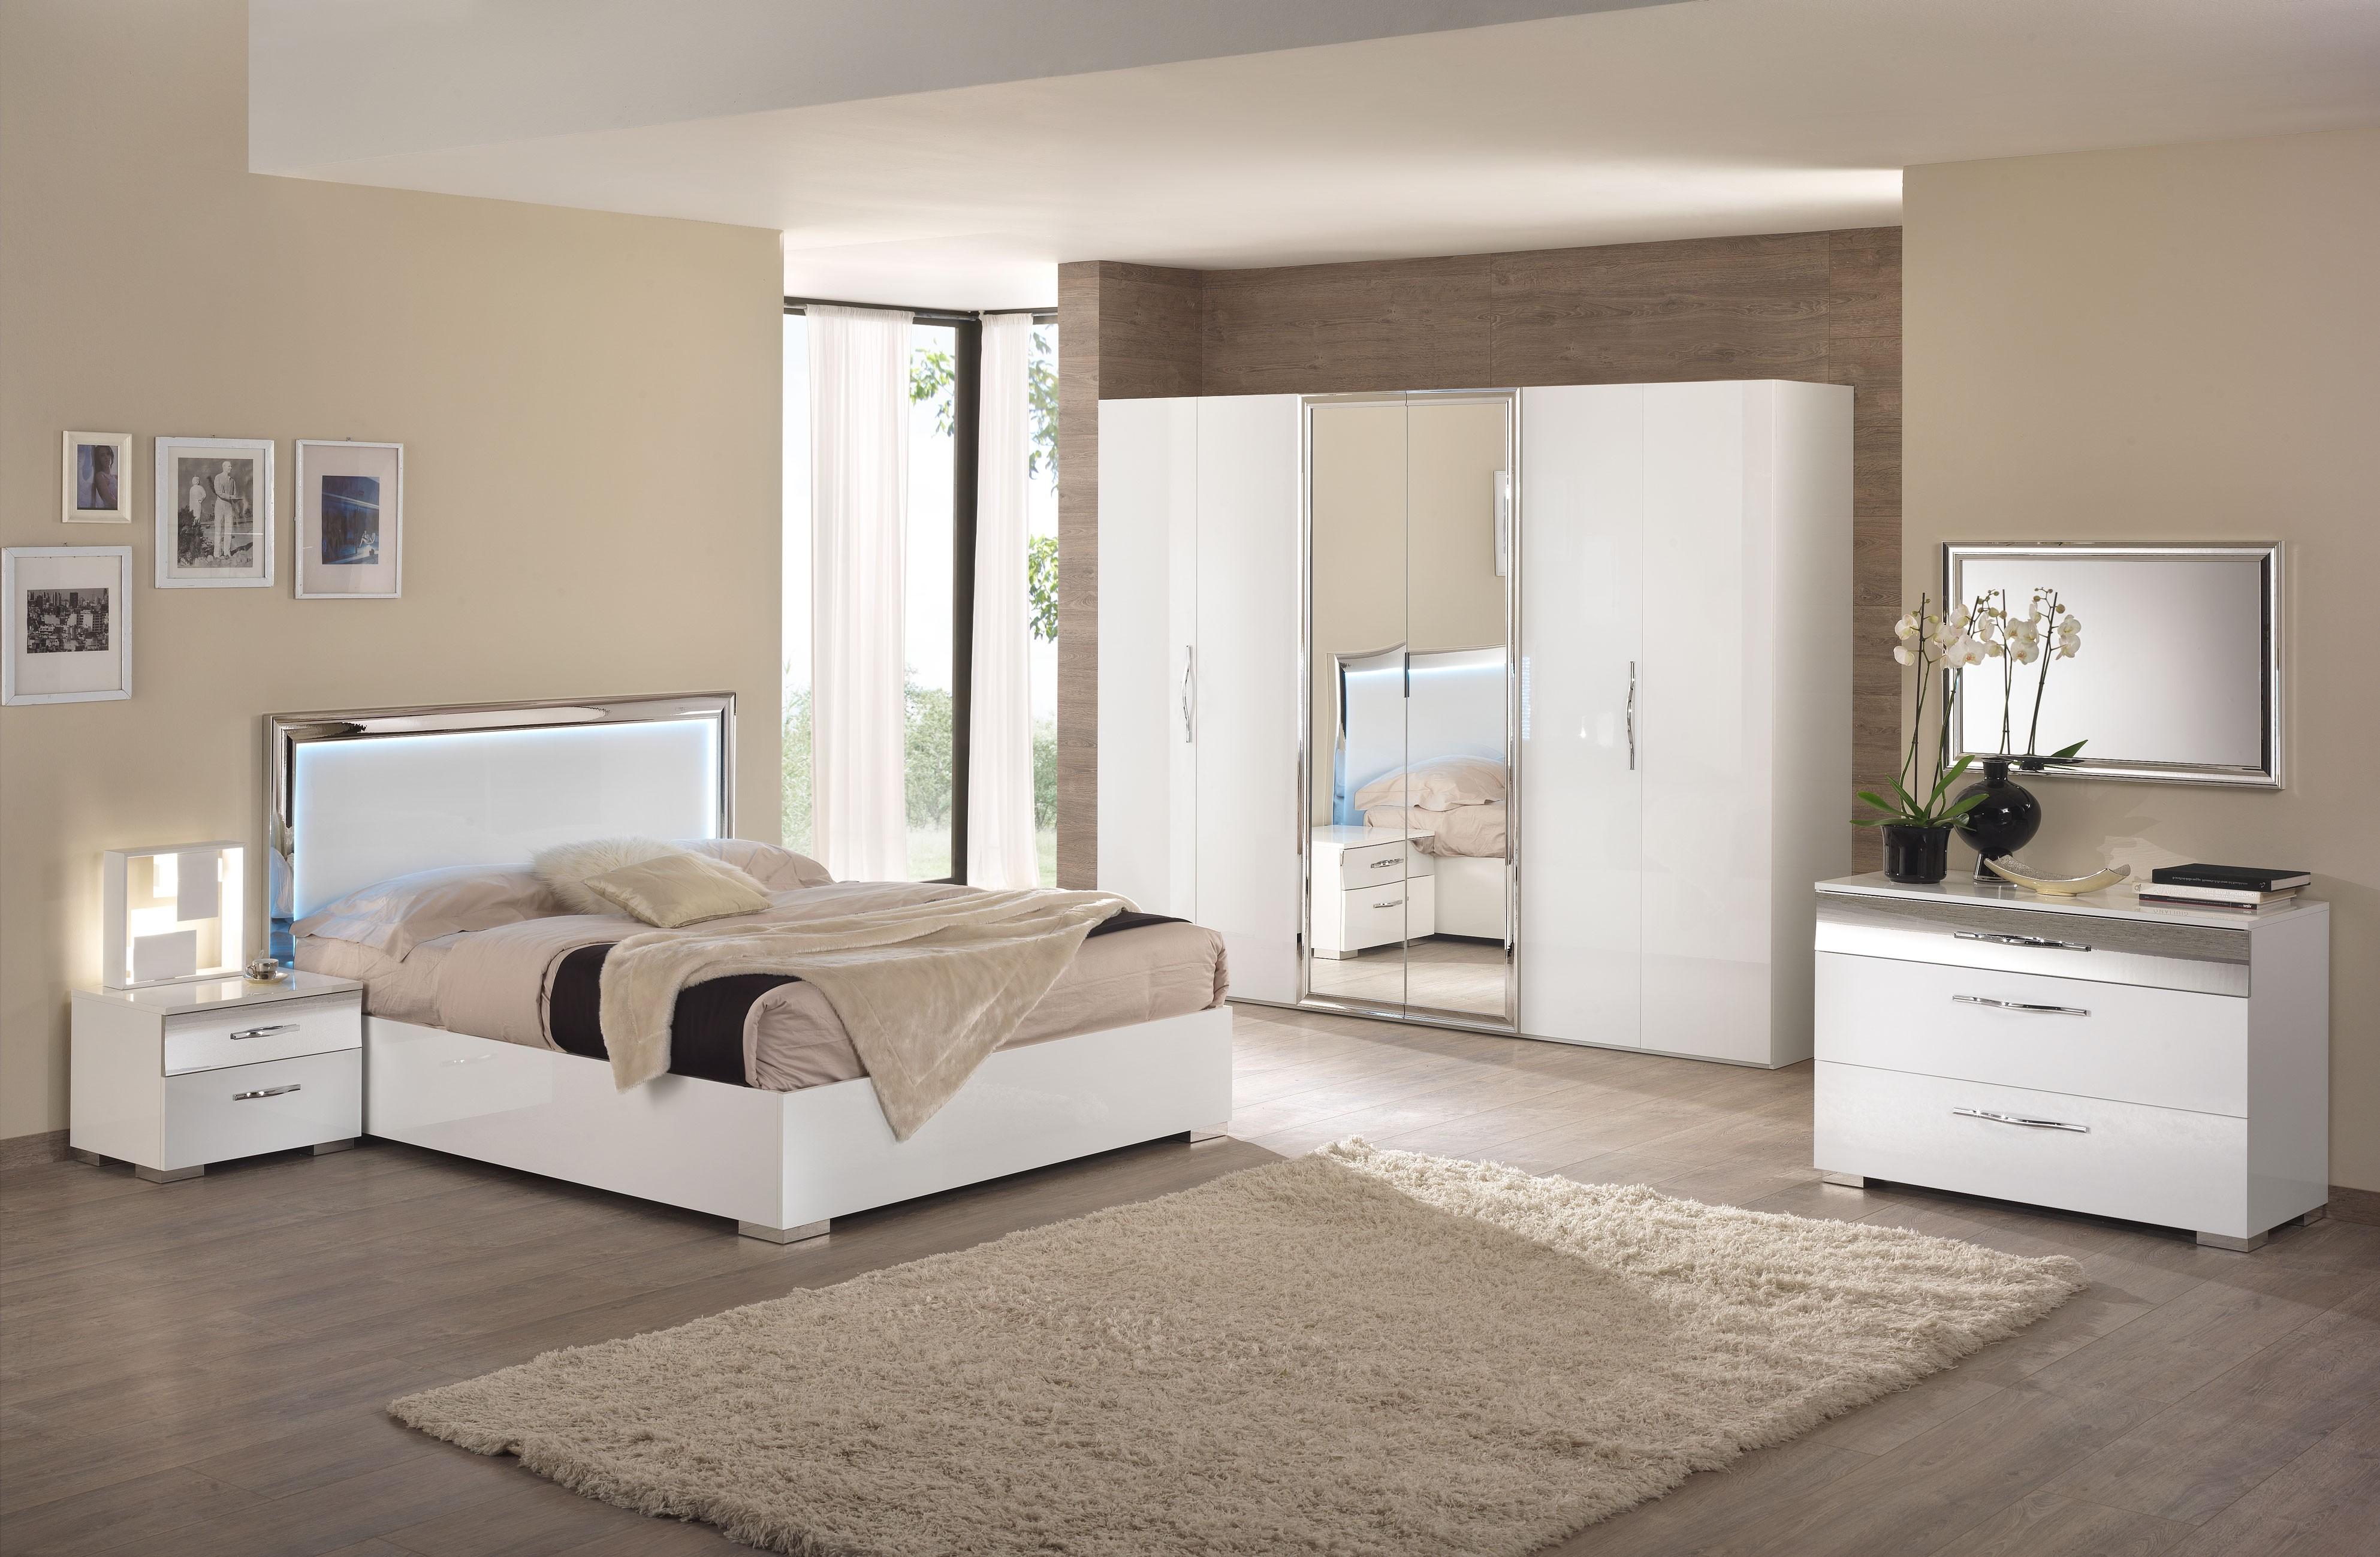 Designer Furniture Store in Sydney